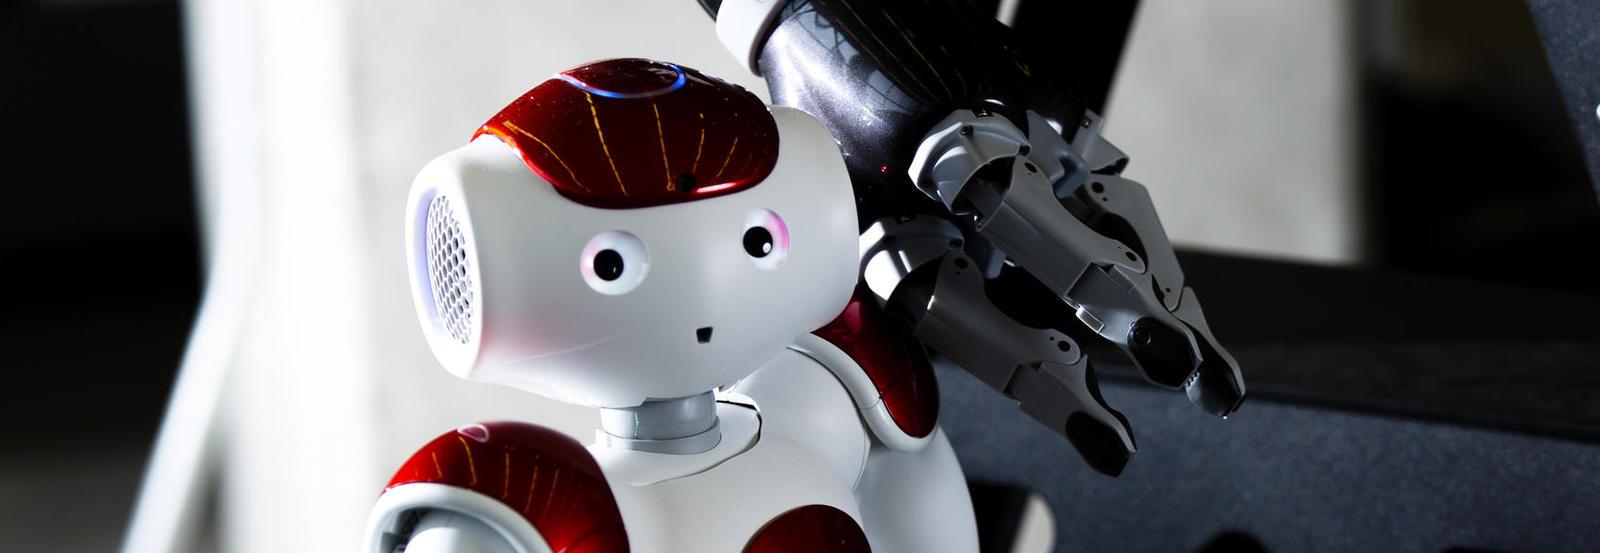 Robohub robots at waterloo engineering